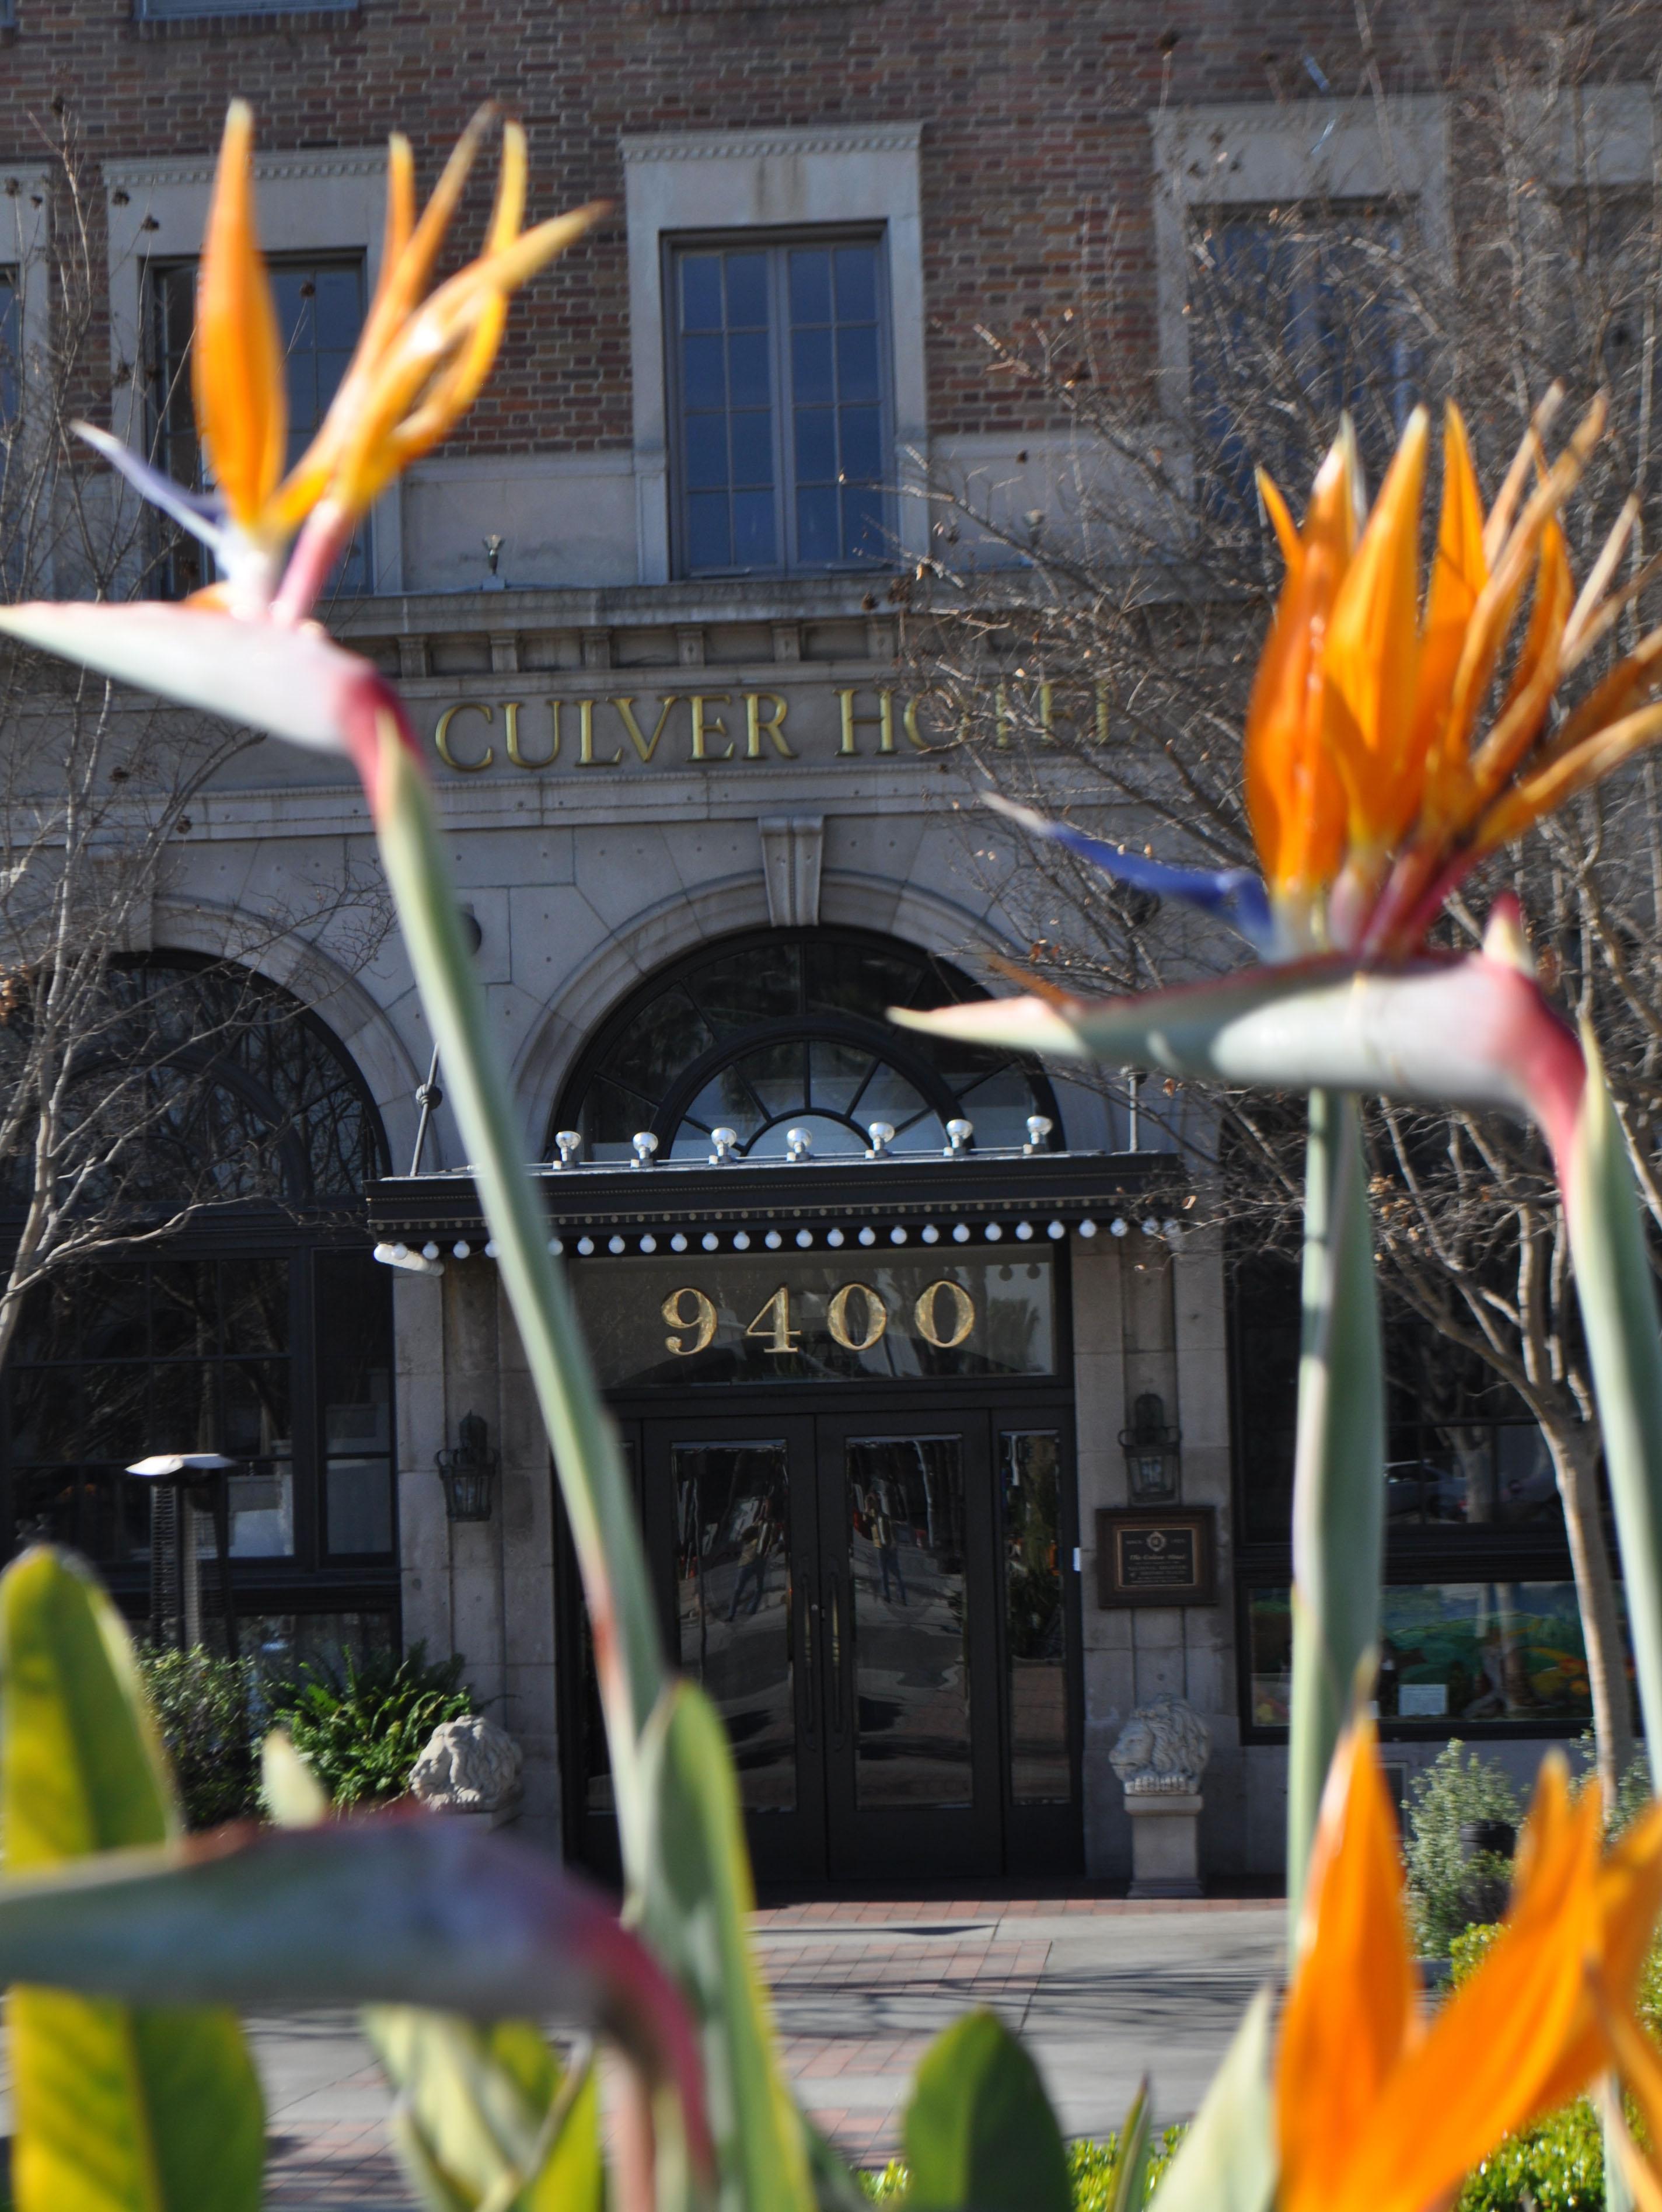 Culver Hotel Entrance & Flowers